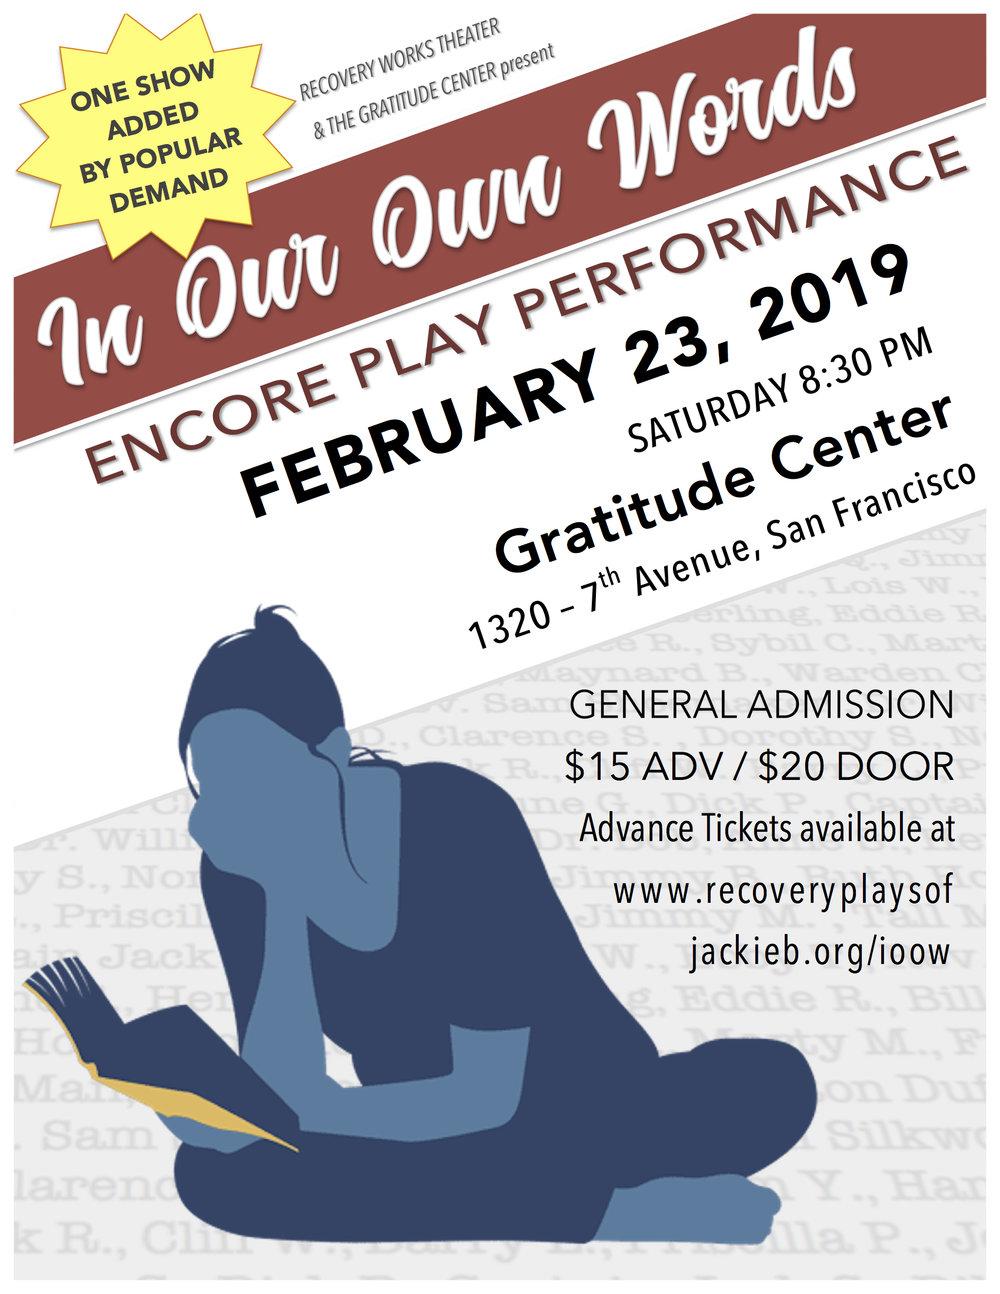 Flyer ENCORE IOOW 10th Anniversary Gratitude Center 2019.docx copy.jpg